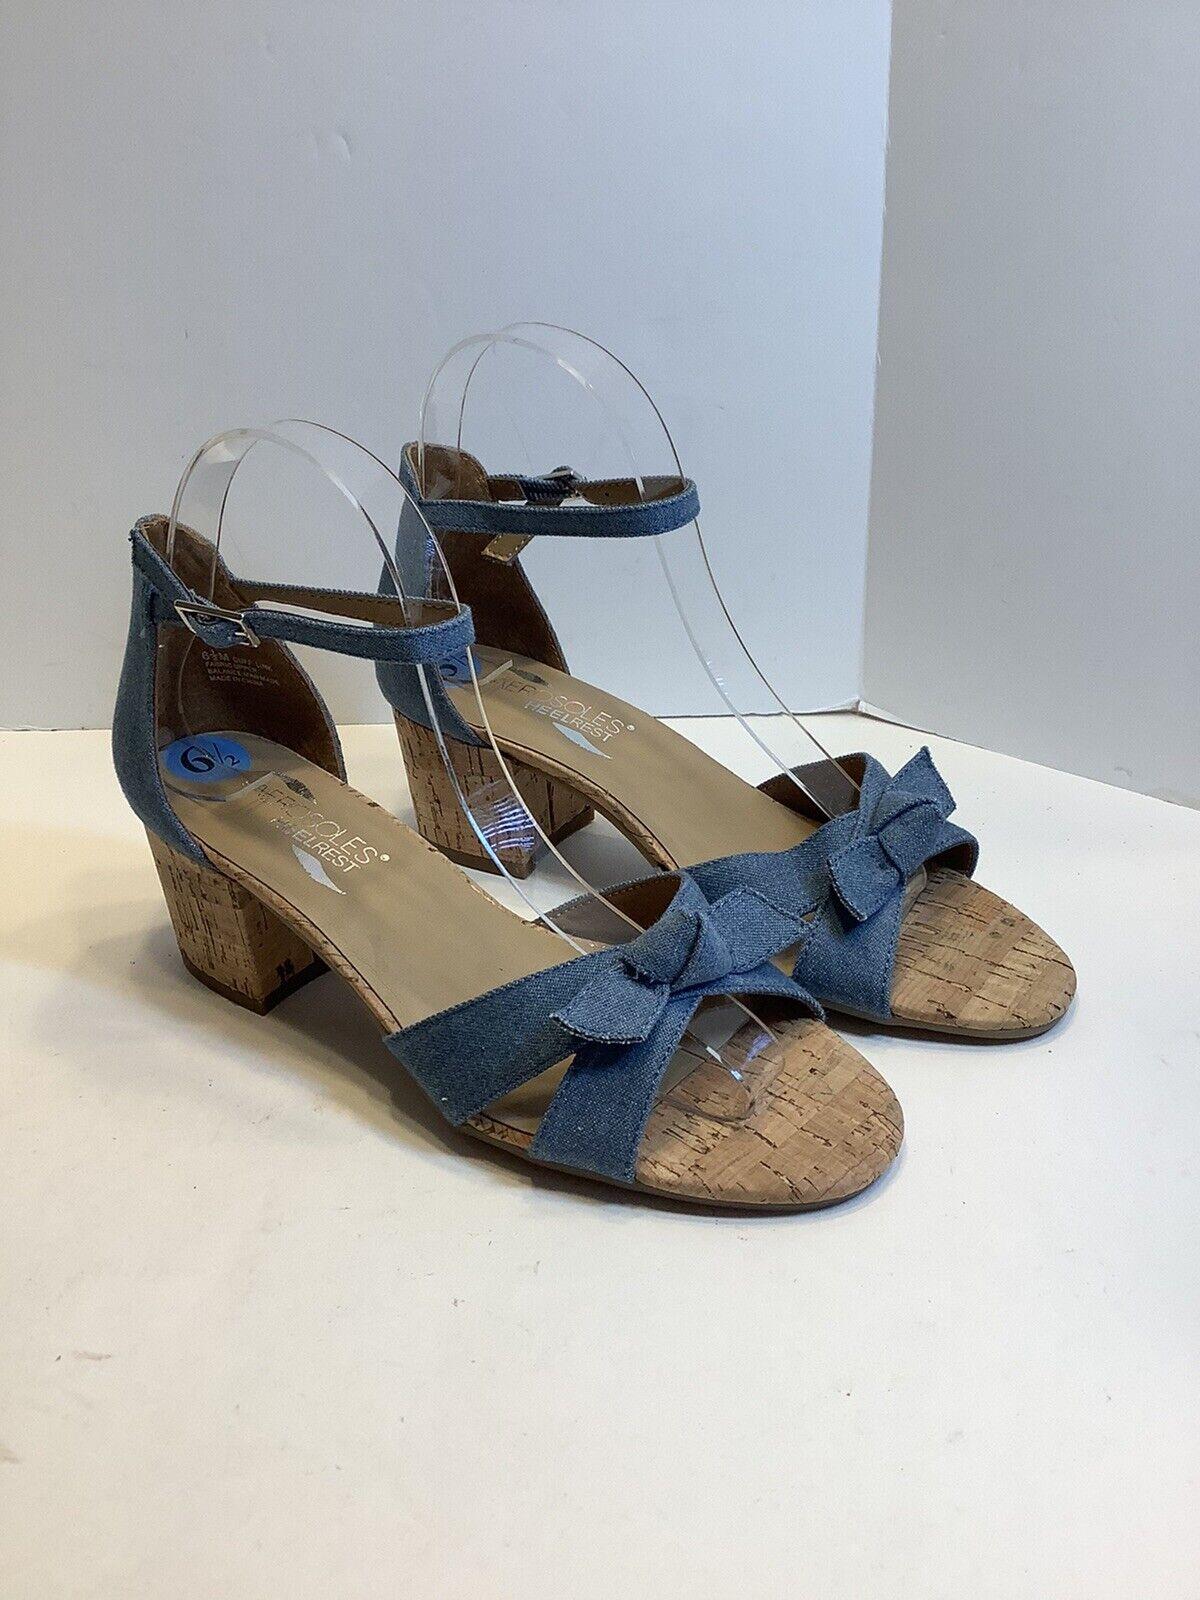 "AEROSOLES Heel Rest ""Cuff Link"" Chunky Heels Sandals Chambray Blue Sz 6.5, New"